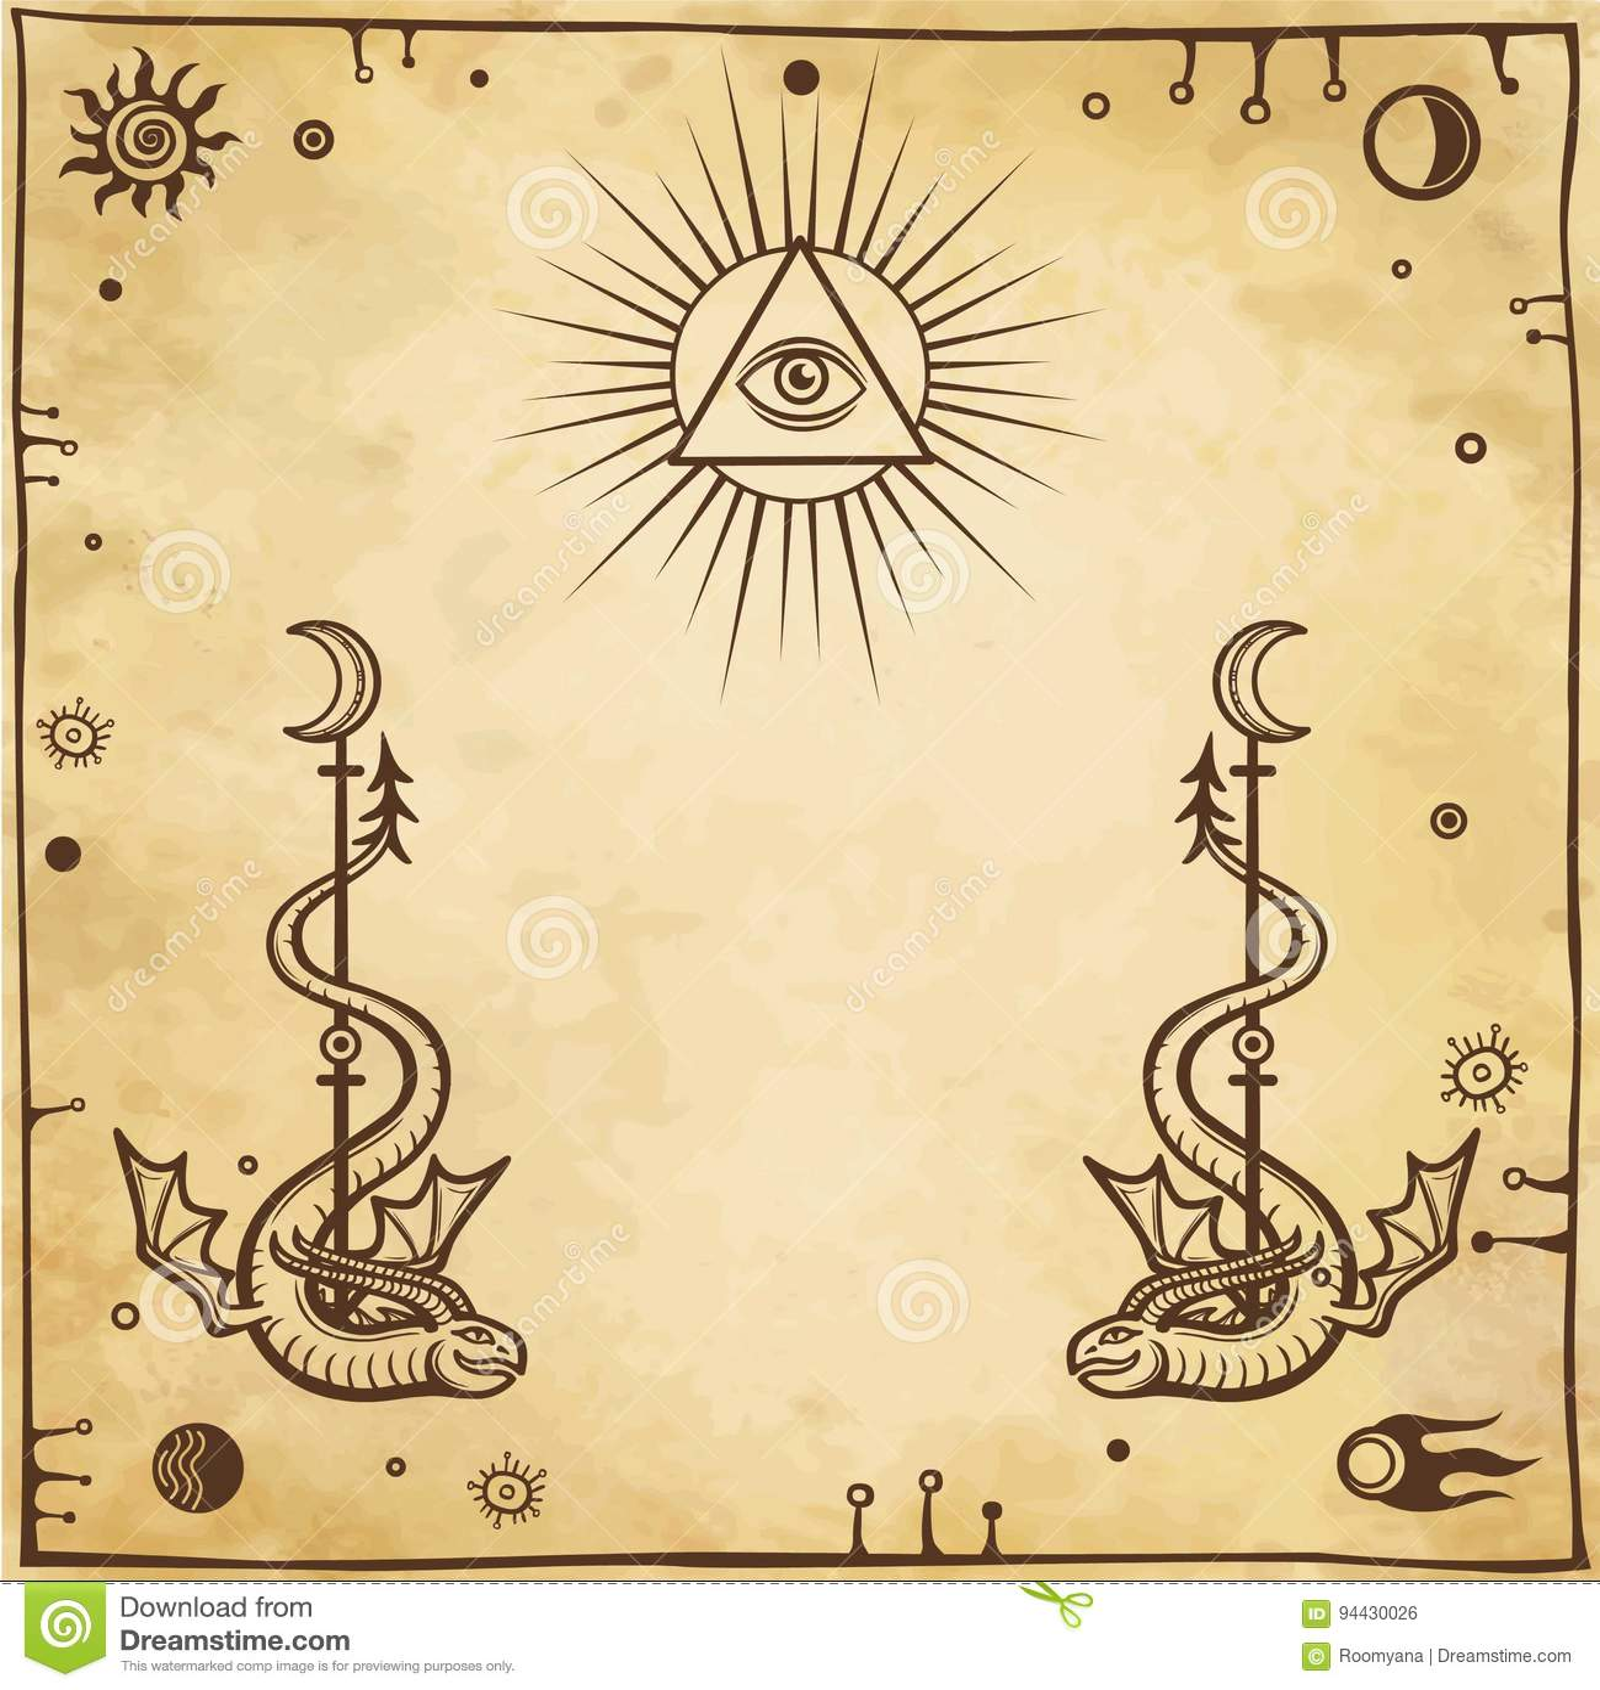 Алхимический чертеж: подогнали змейки, всевидящее око